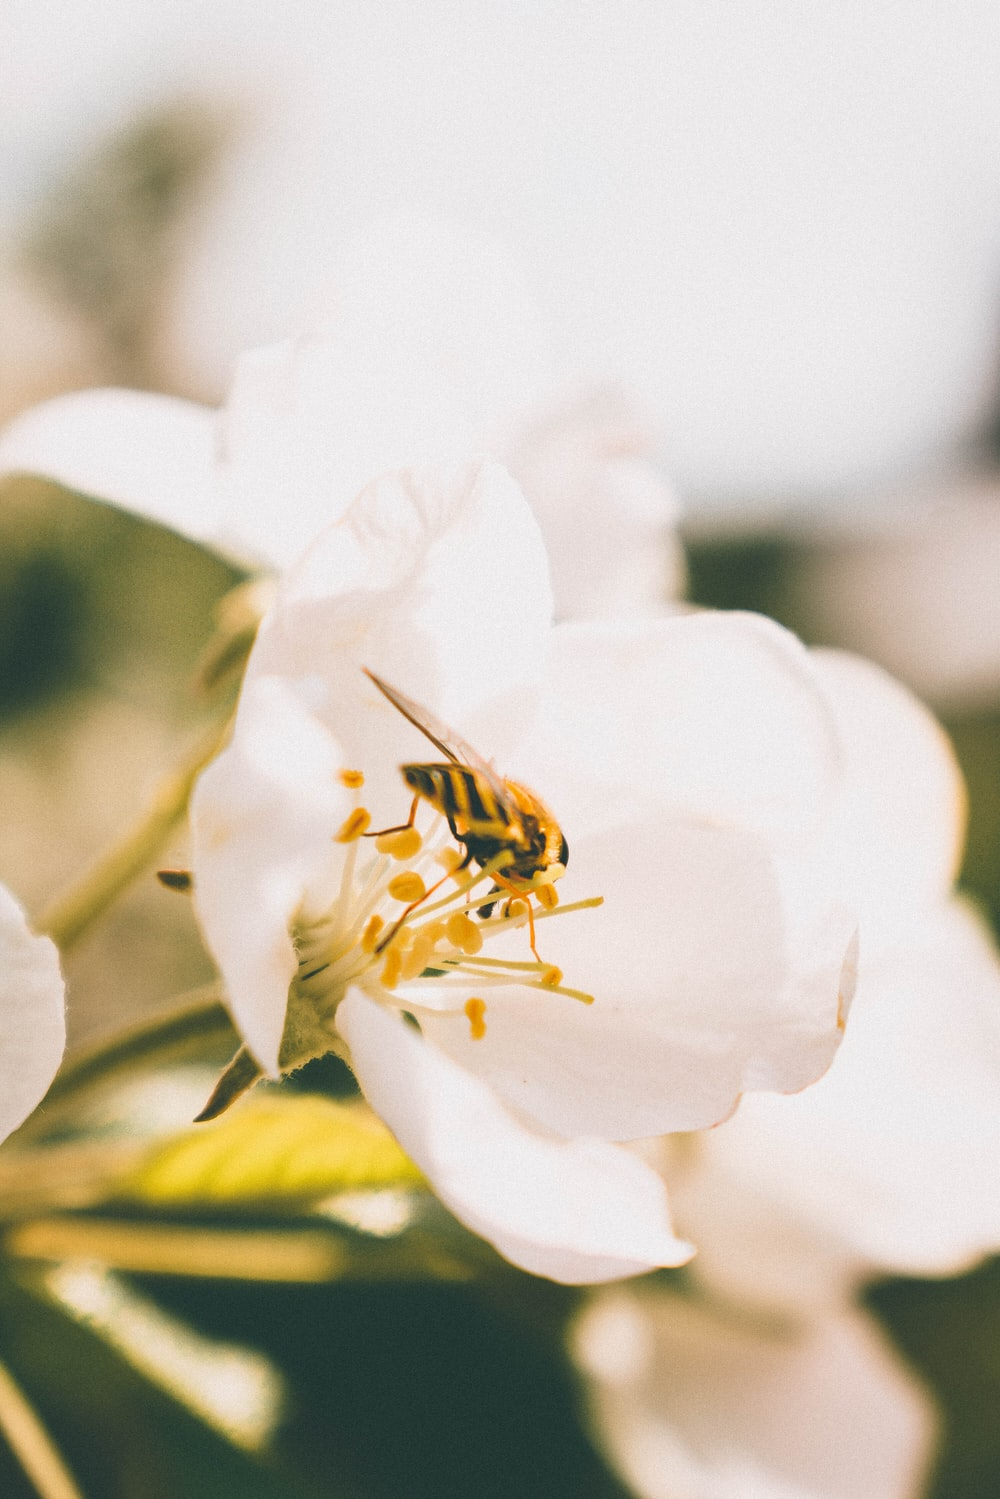 bumblebee on white petal flower